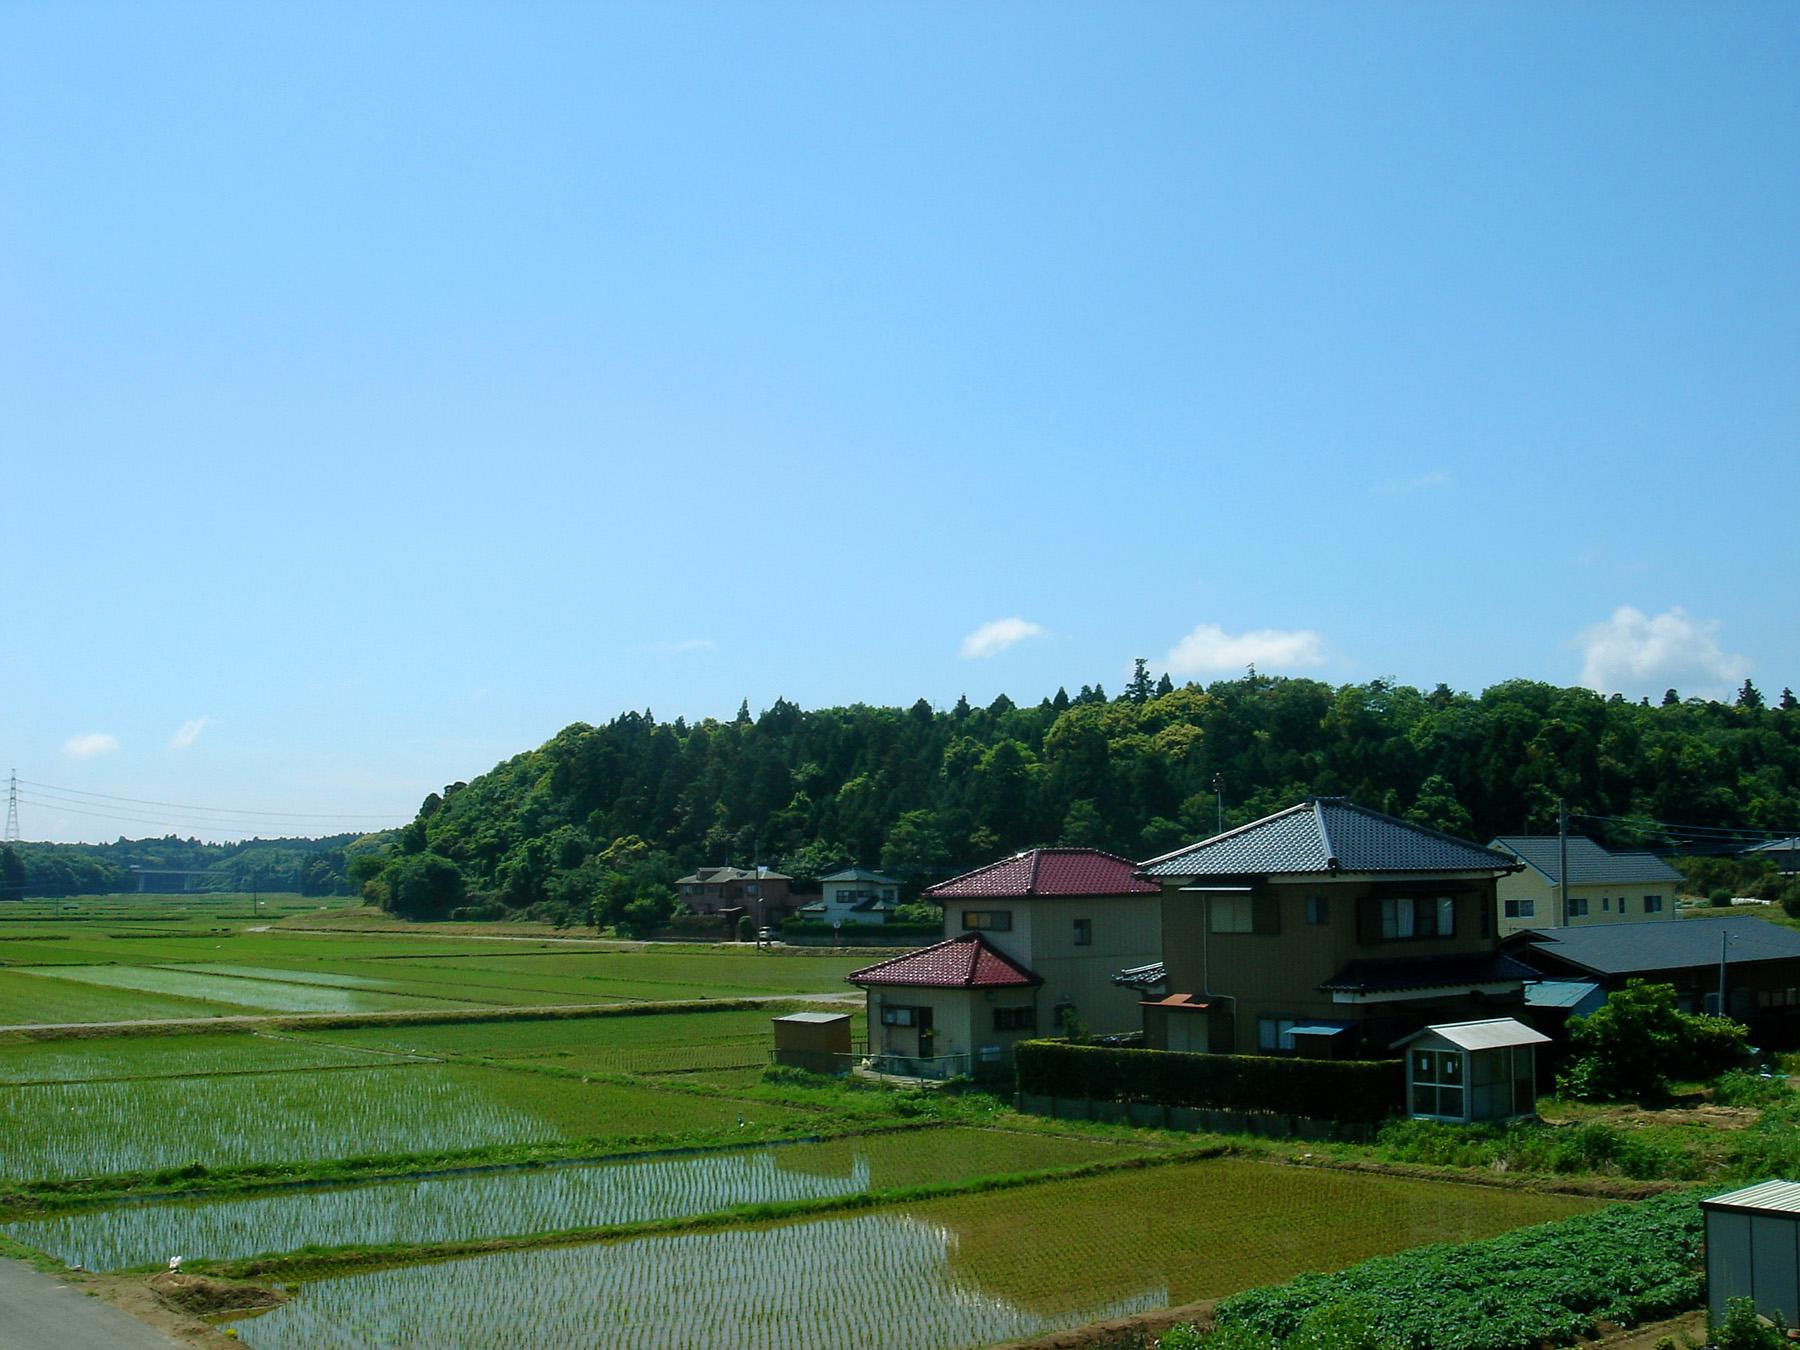 Field Crops Rice Rice Fields in Sawara Chiba